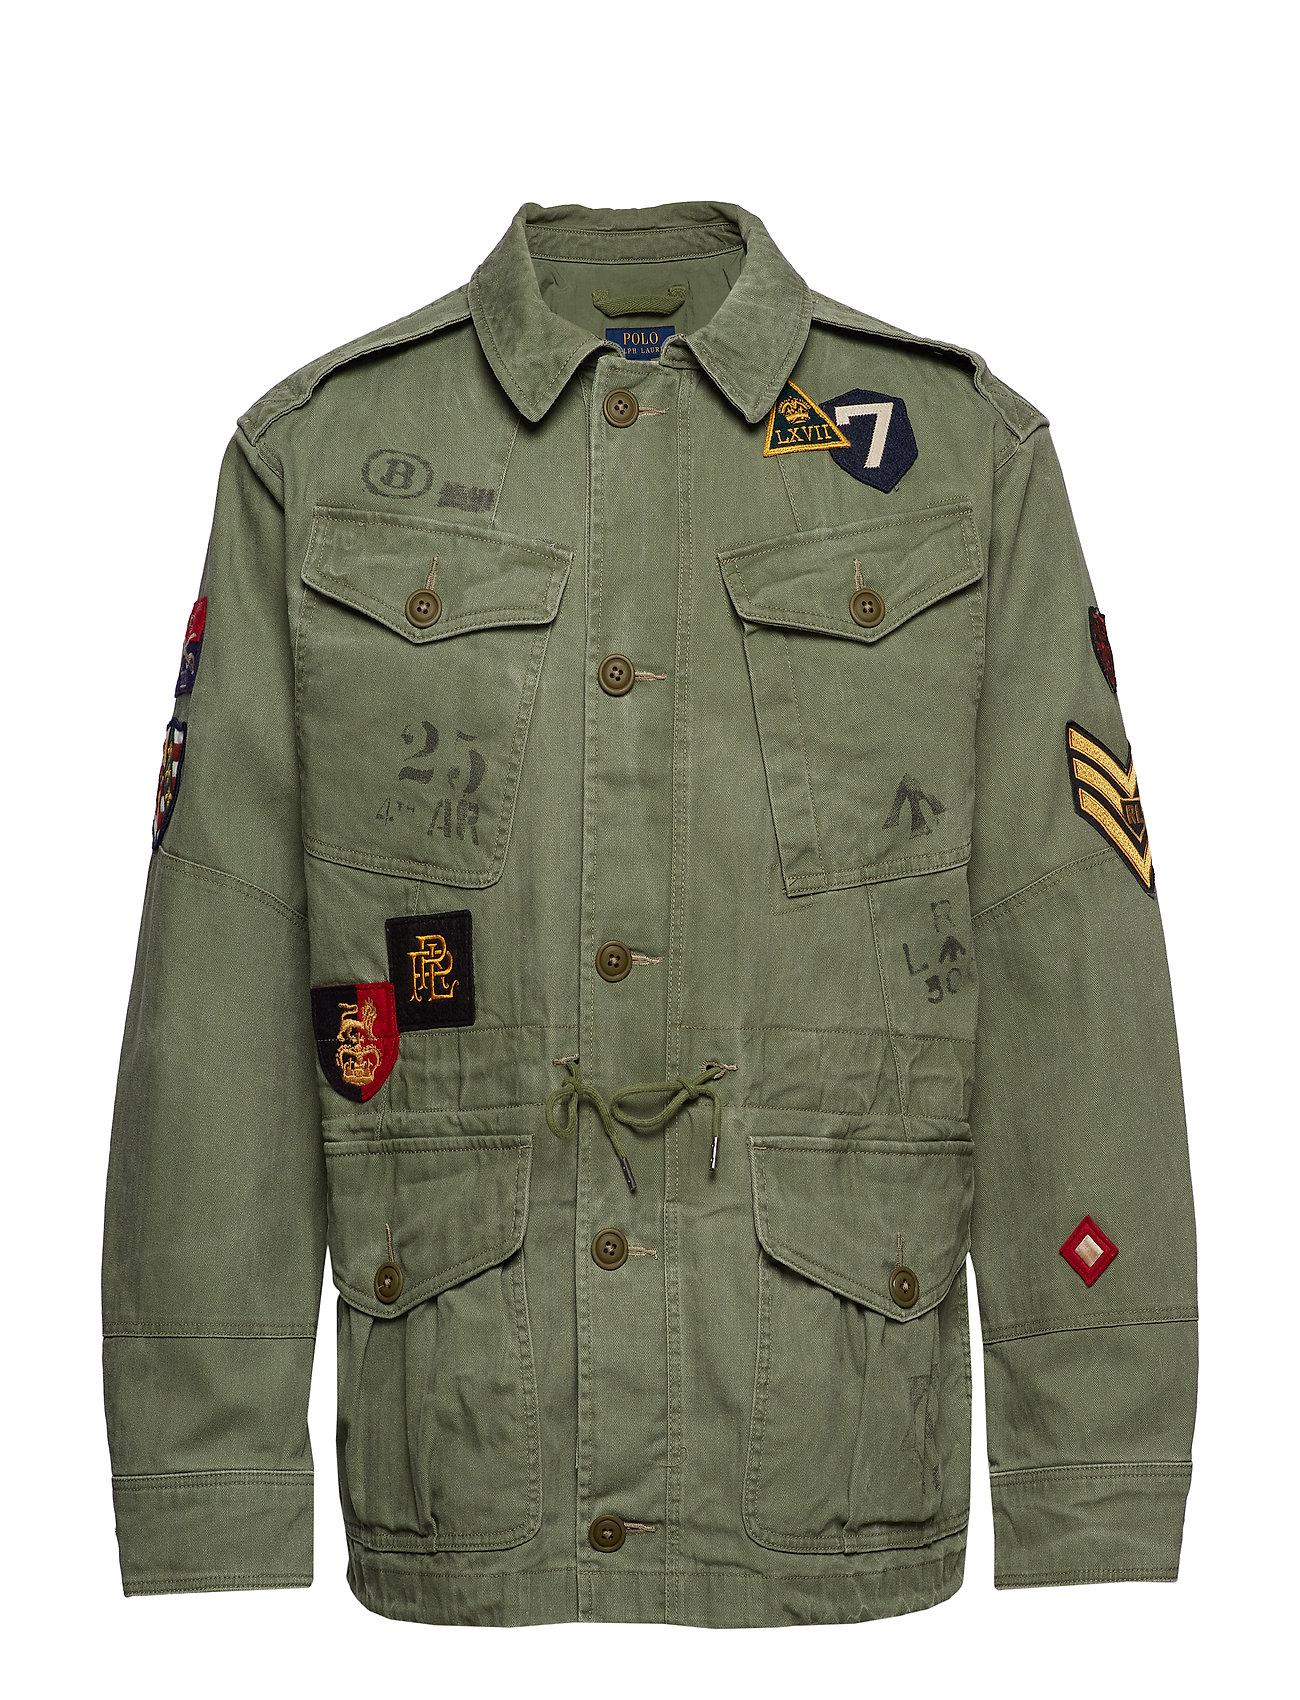 Polo Ralph Lauren Herringbone Twill Jacket - ARMY OLIVE